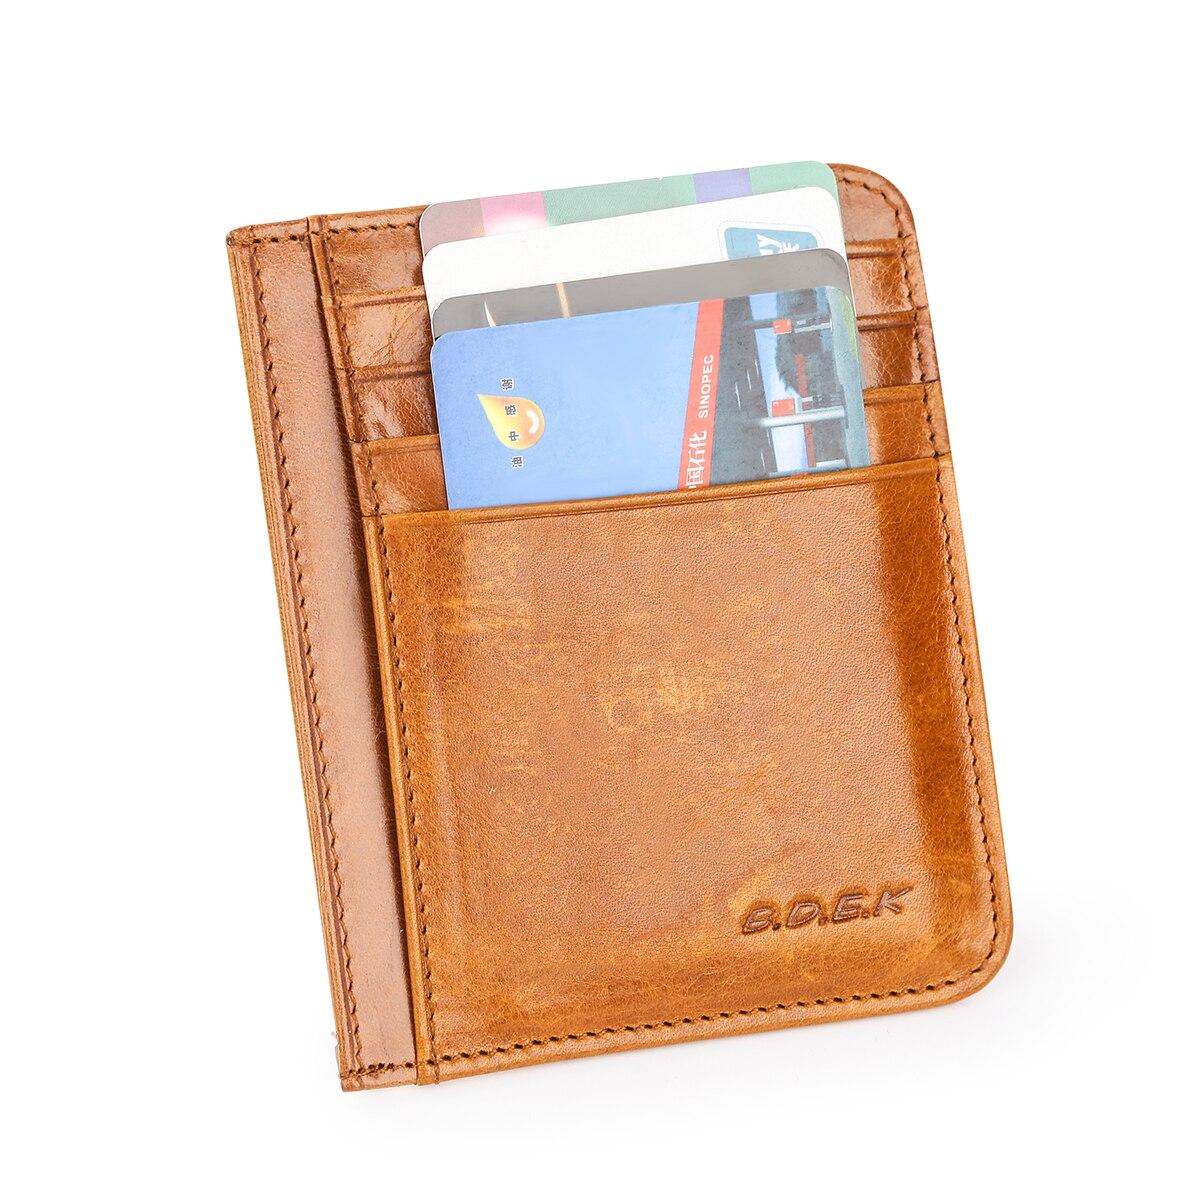 Bruin Crazy House echt echt leder ID Creditcardhouder Mini - Portemonnees en portefeuilles